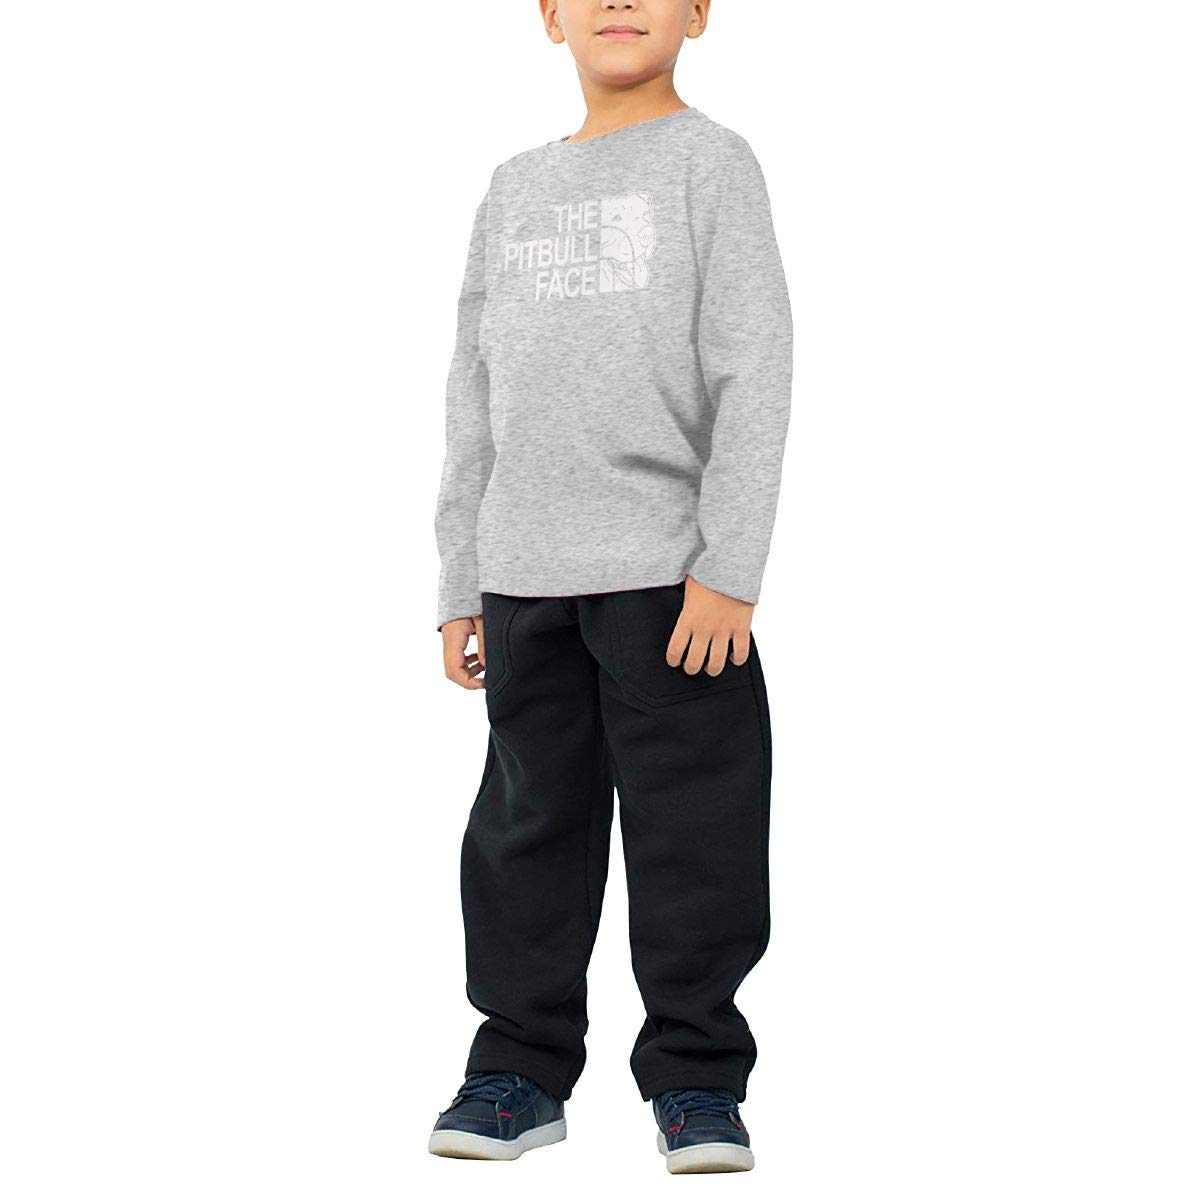 WCHUNMU Funny Pitbull Childrens Cotton Gray Long Sleeve Round Neck Boys Or Girls Tee Shirt